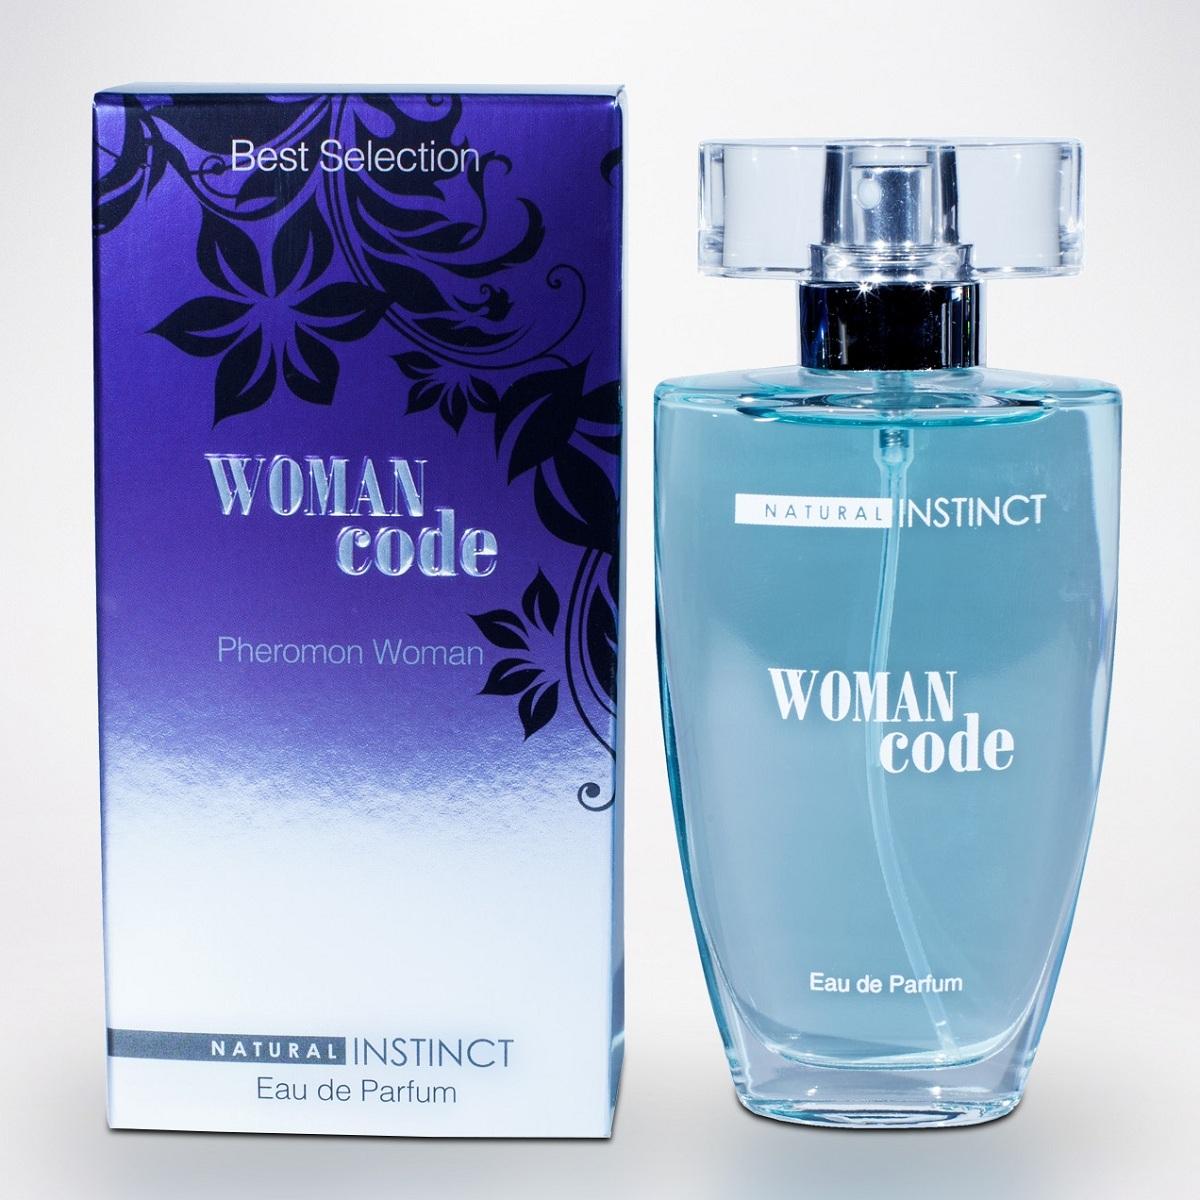 Духи и смазки для женщин: Женские духи с феромонами Natural Instinct Woman Code - 50 мл.